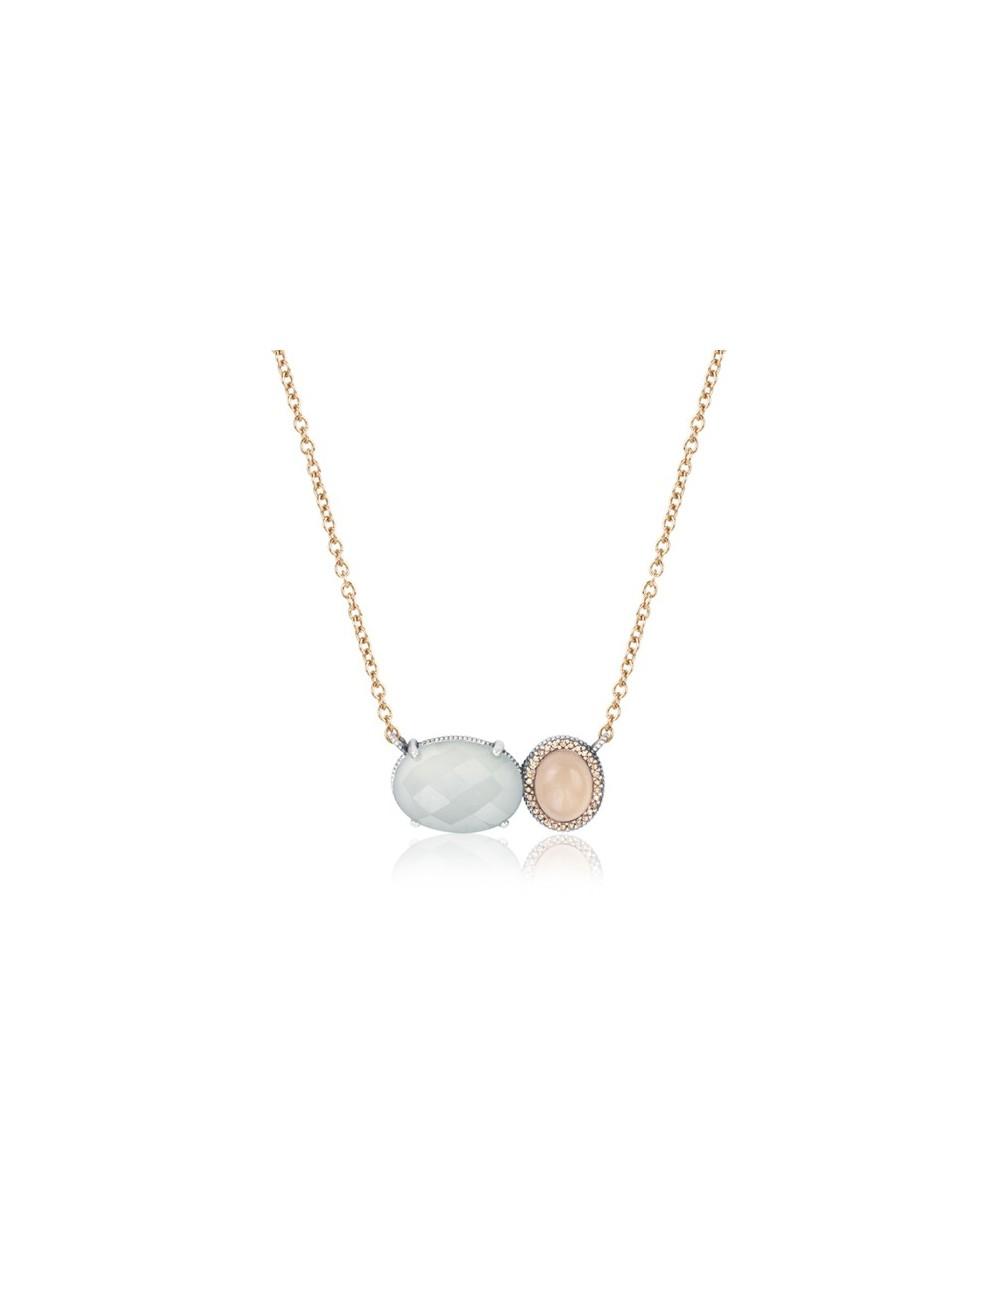 Sunfield -Collar Sunfield plata, calcedonia, cuarzo rosa y circonitas -CL062506